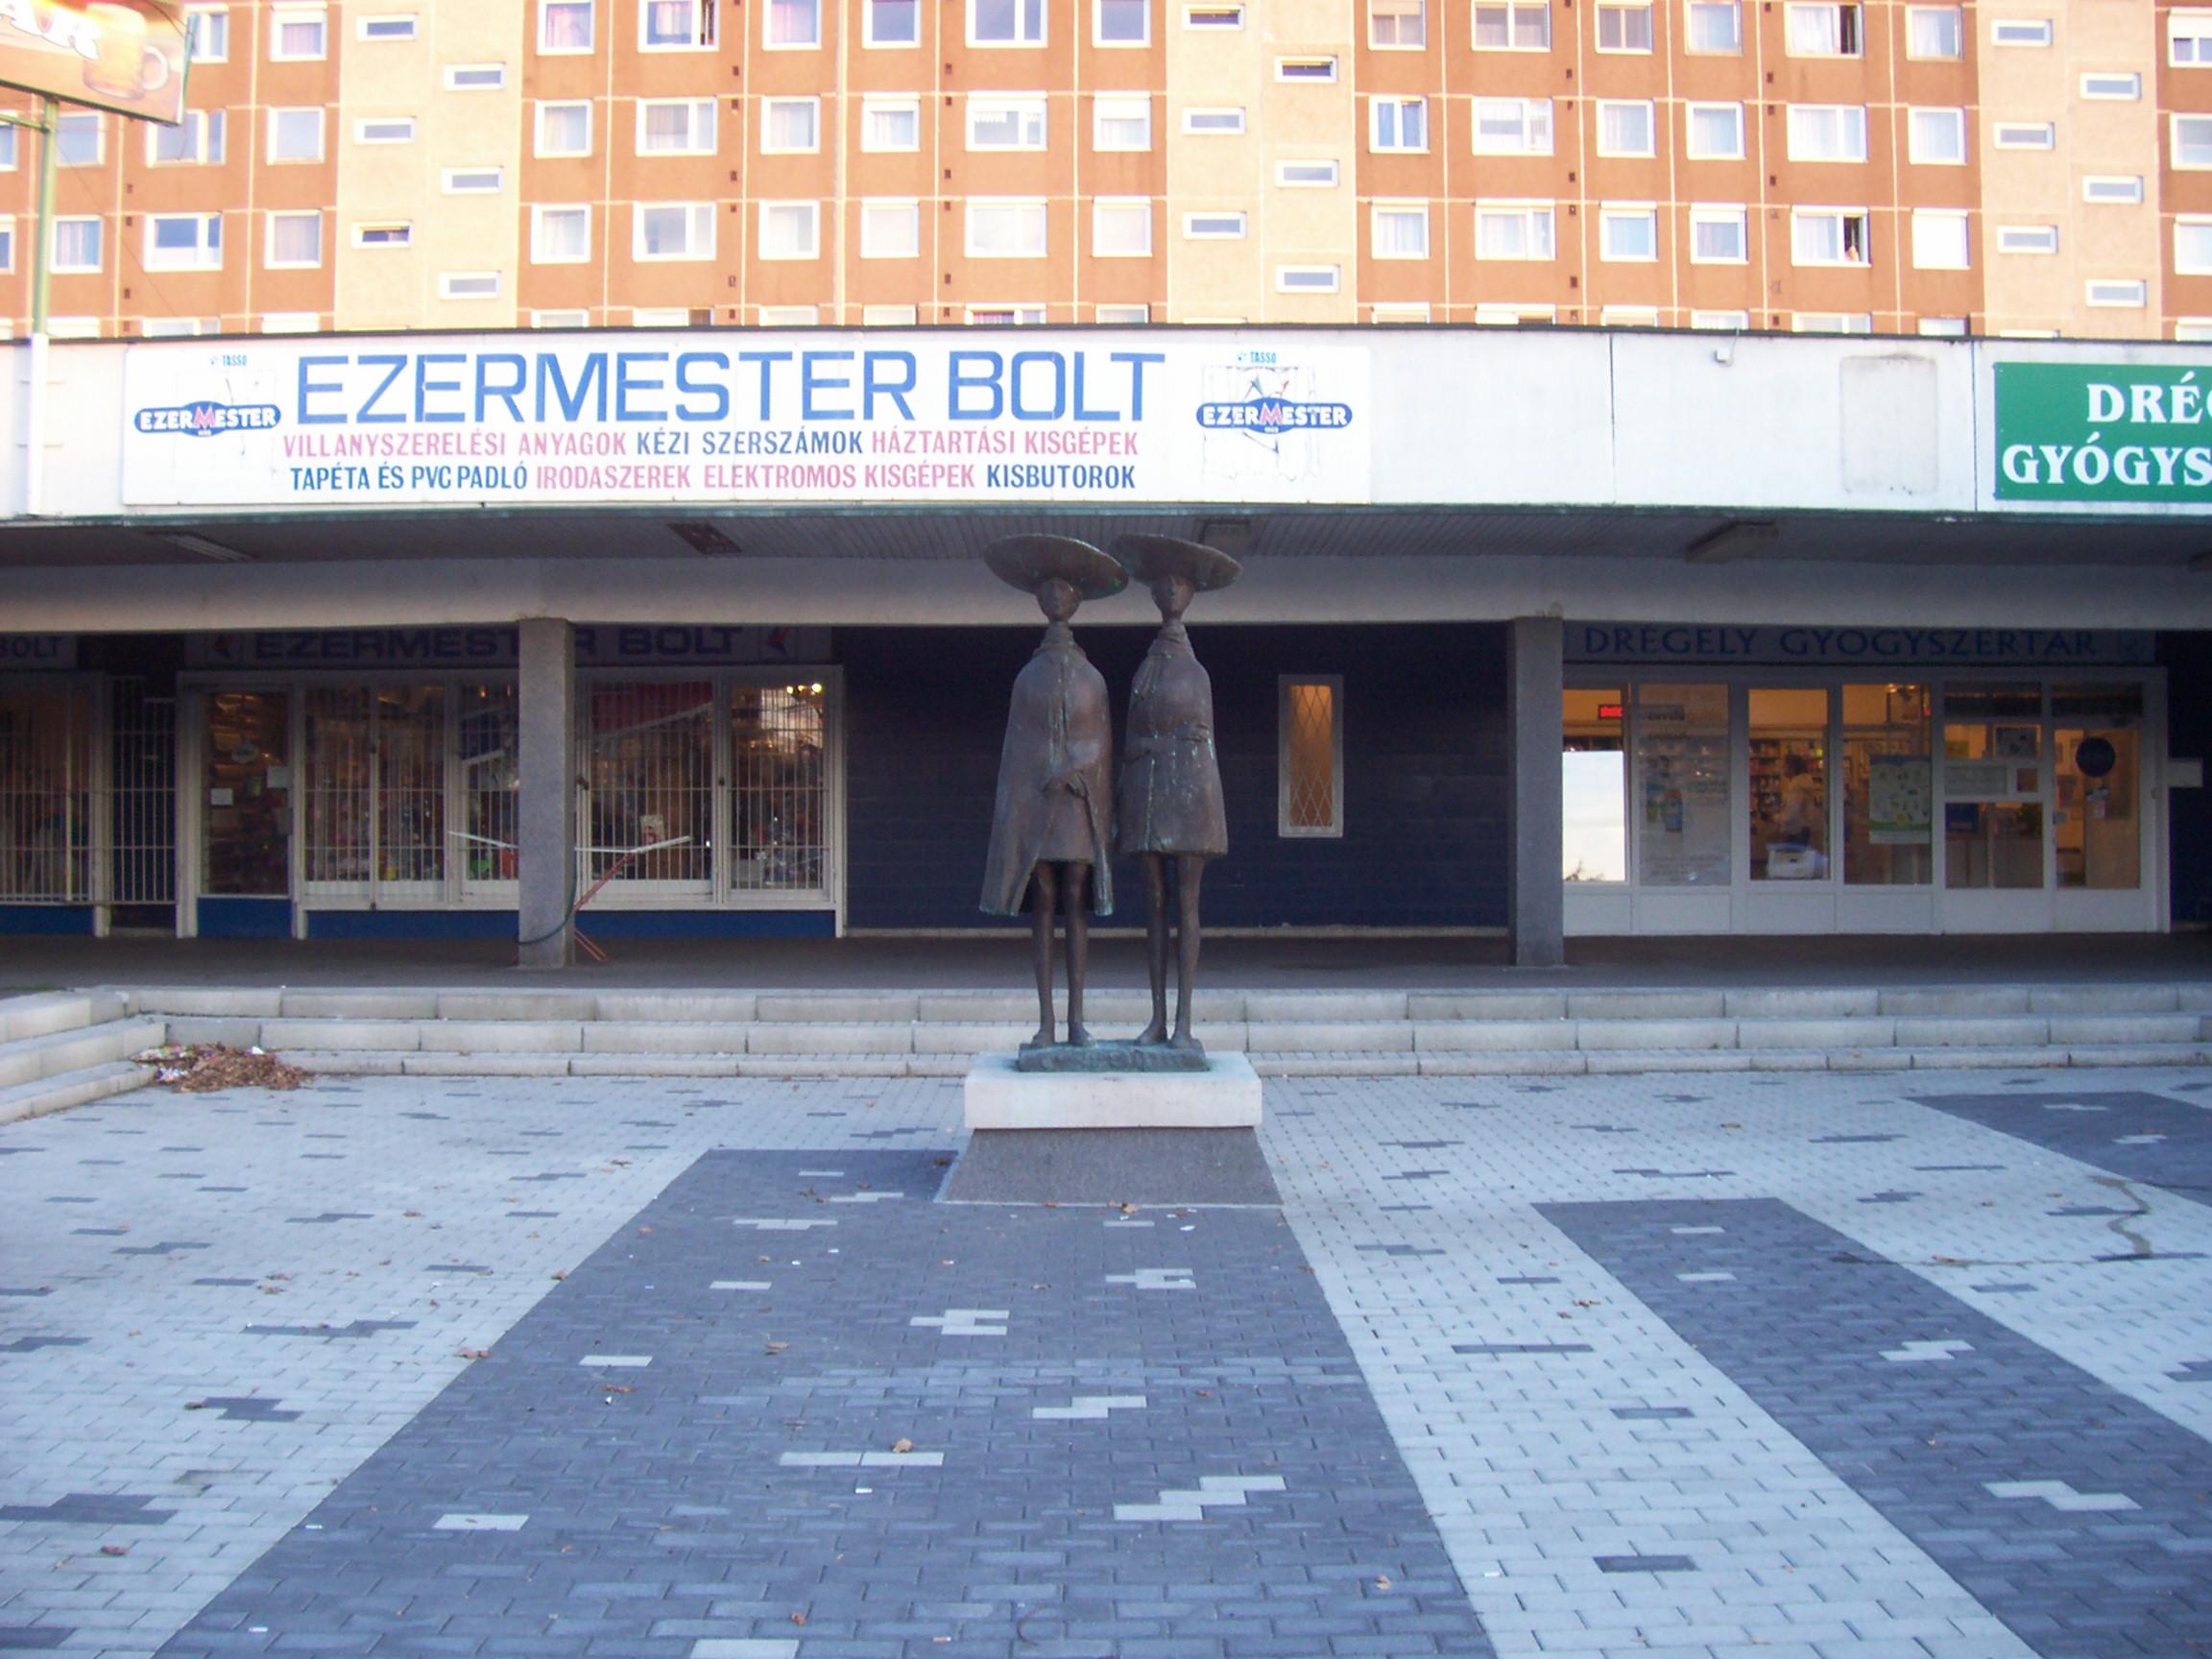 Dregelyvar Utca Wikipedia